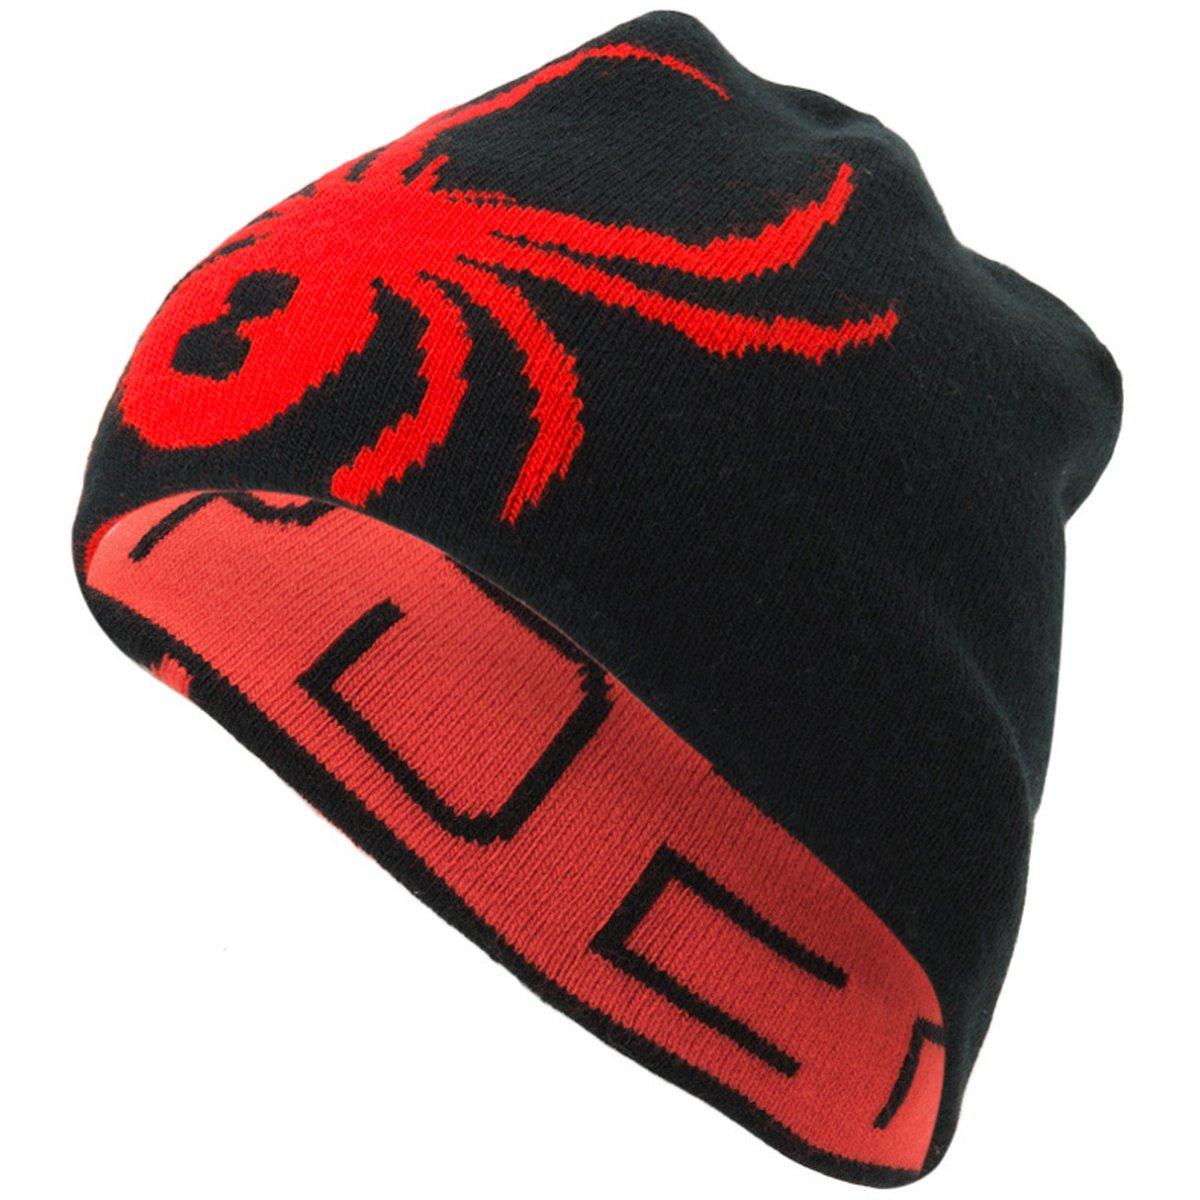 Details about Spyder REVERSIBLE INNSBRUCK Men s Ski Hat - black - One Size 9db61583e57